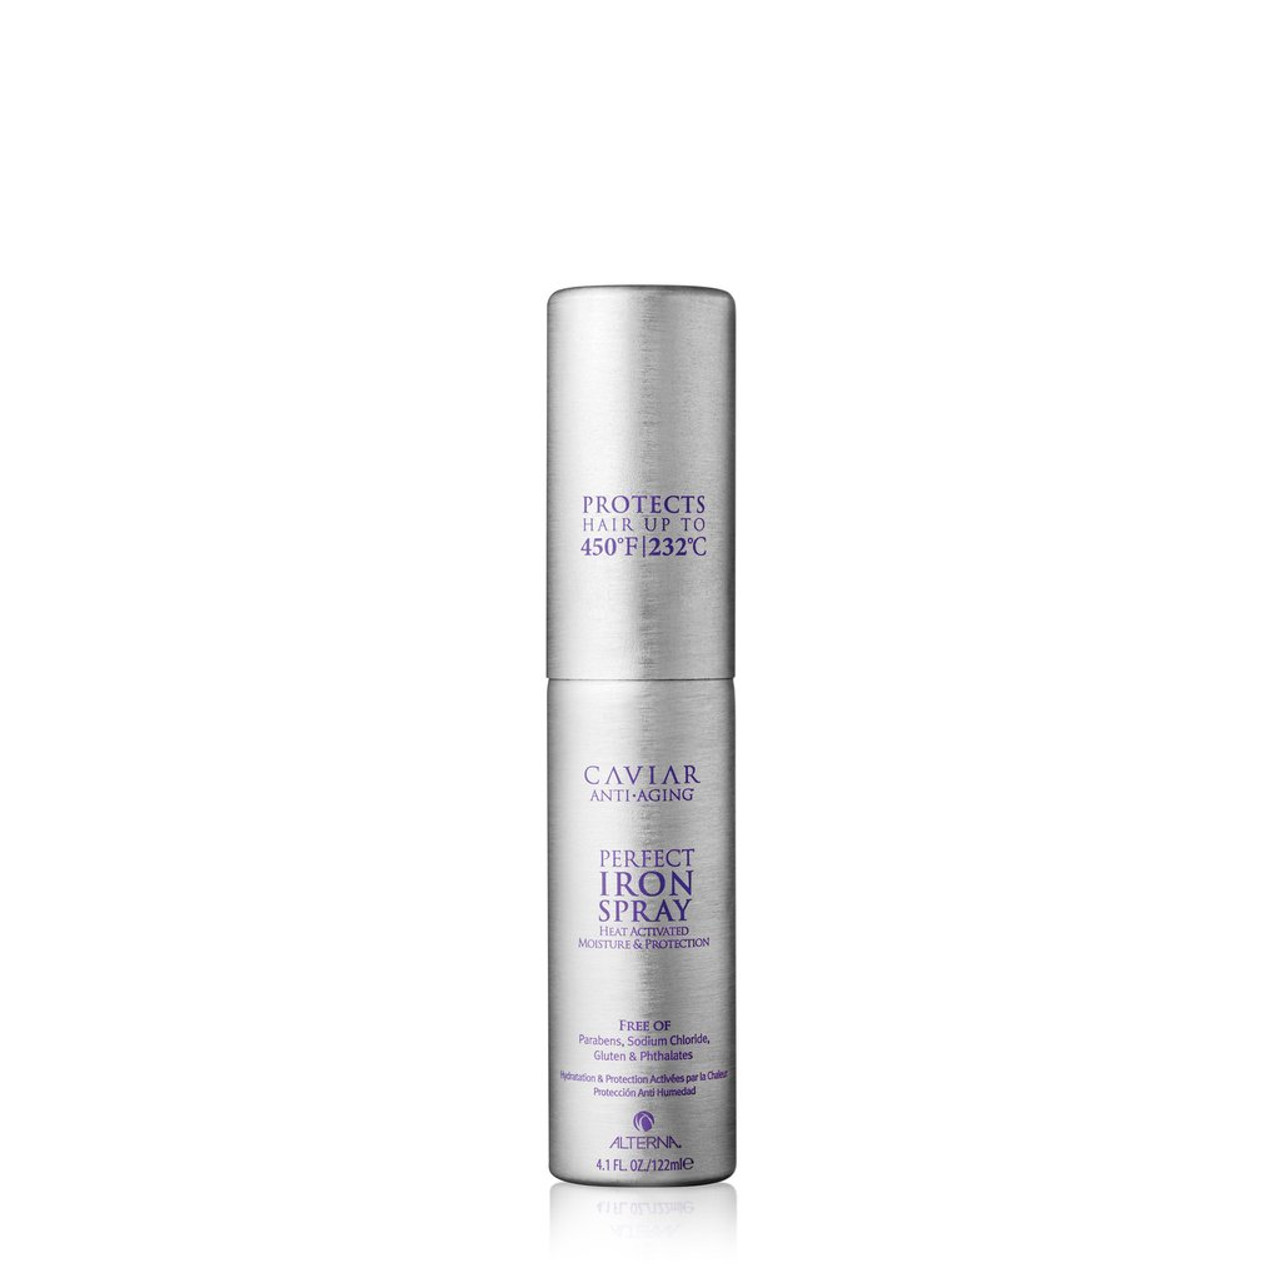 Alterna Caviar Perfect Iron Spray, 4.1 fl oz (122 ml)